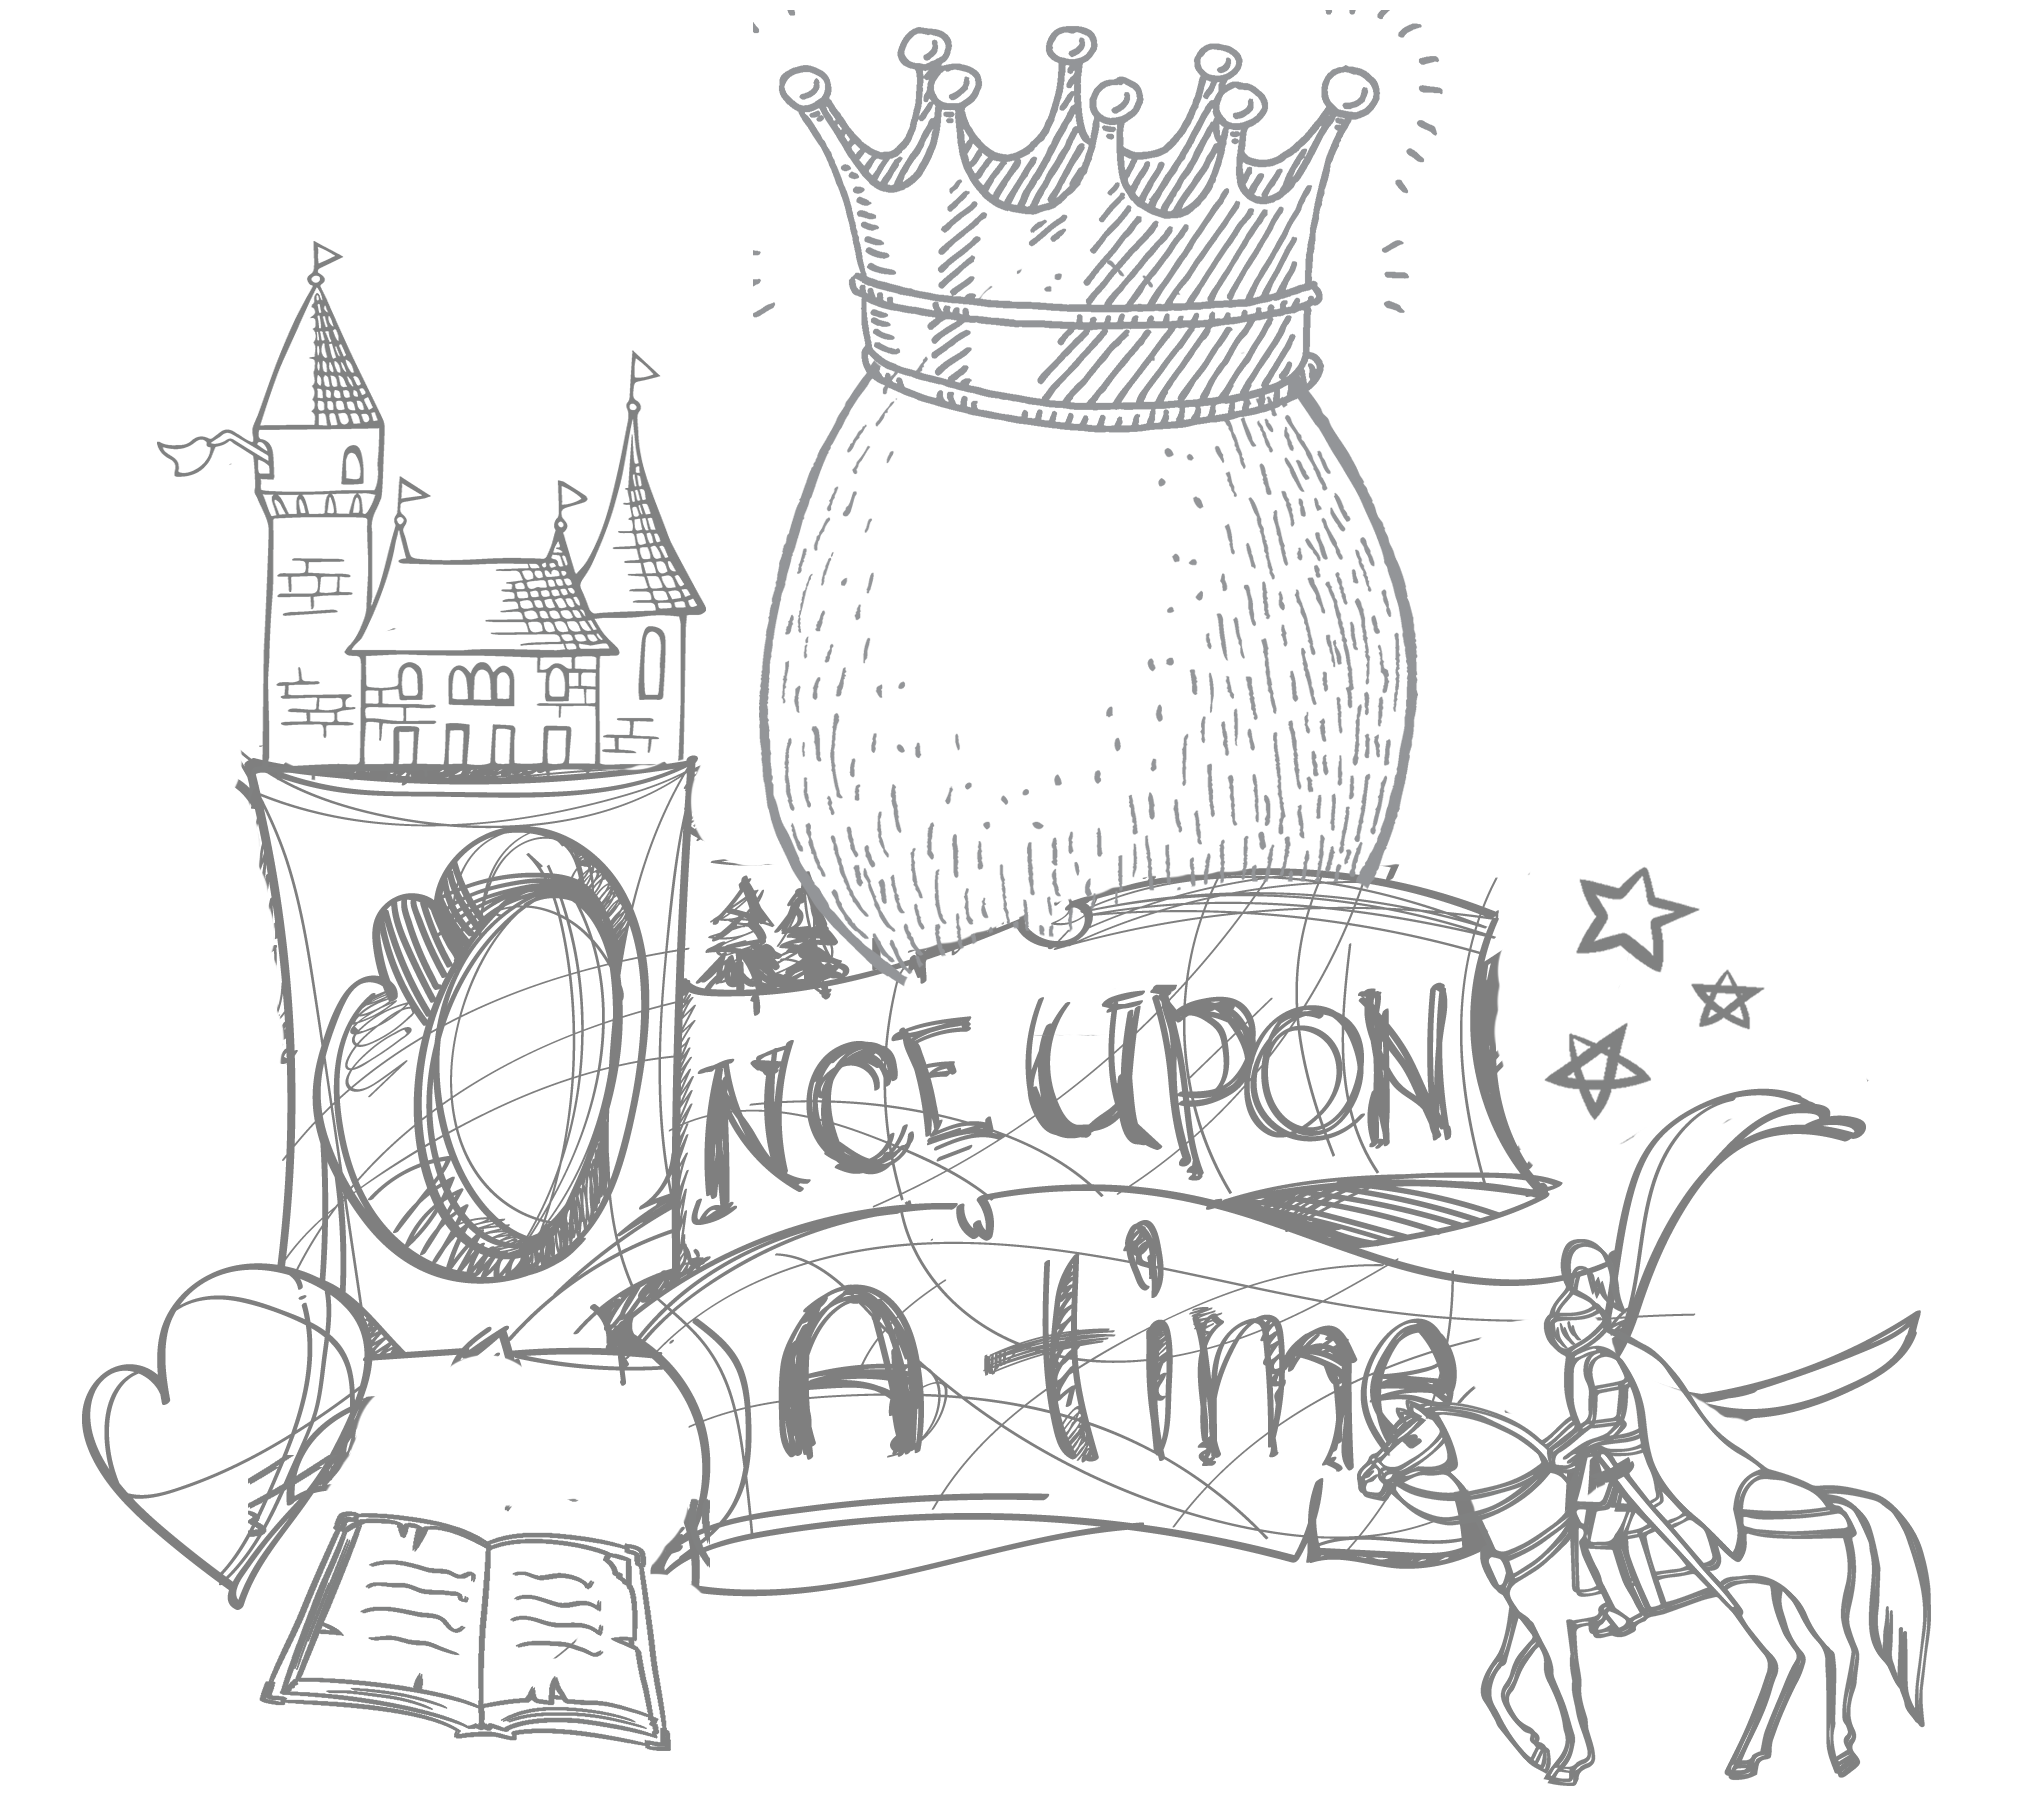 Estonia the egg born. Fairytale clipart magic book